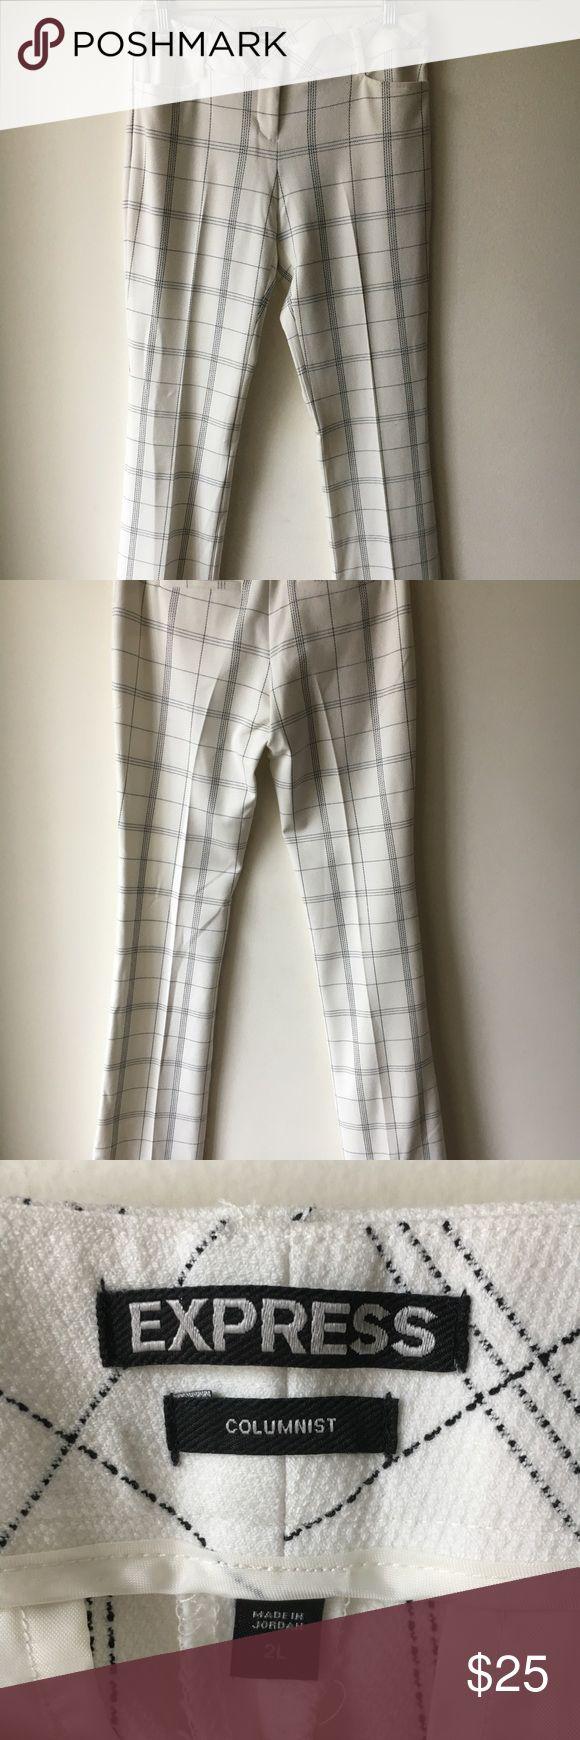 I just added this listing on Poshmark: Express Columnist Pant - 2 Long. #shopmycloset #poshmark #fashion #shopping #style #forsale #Express #Pants